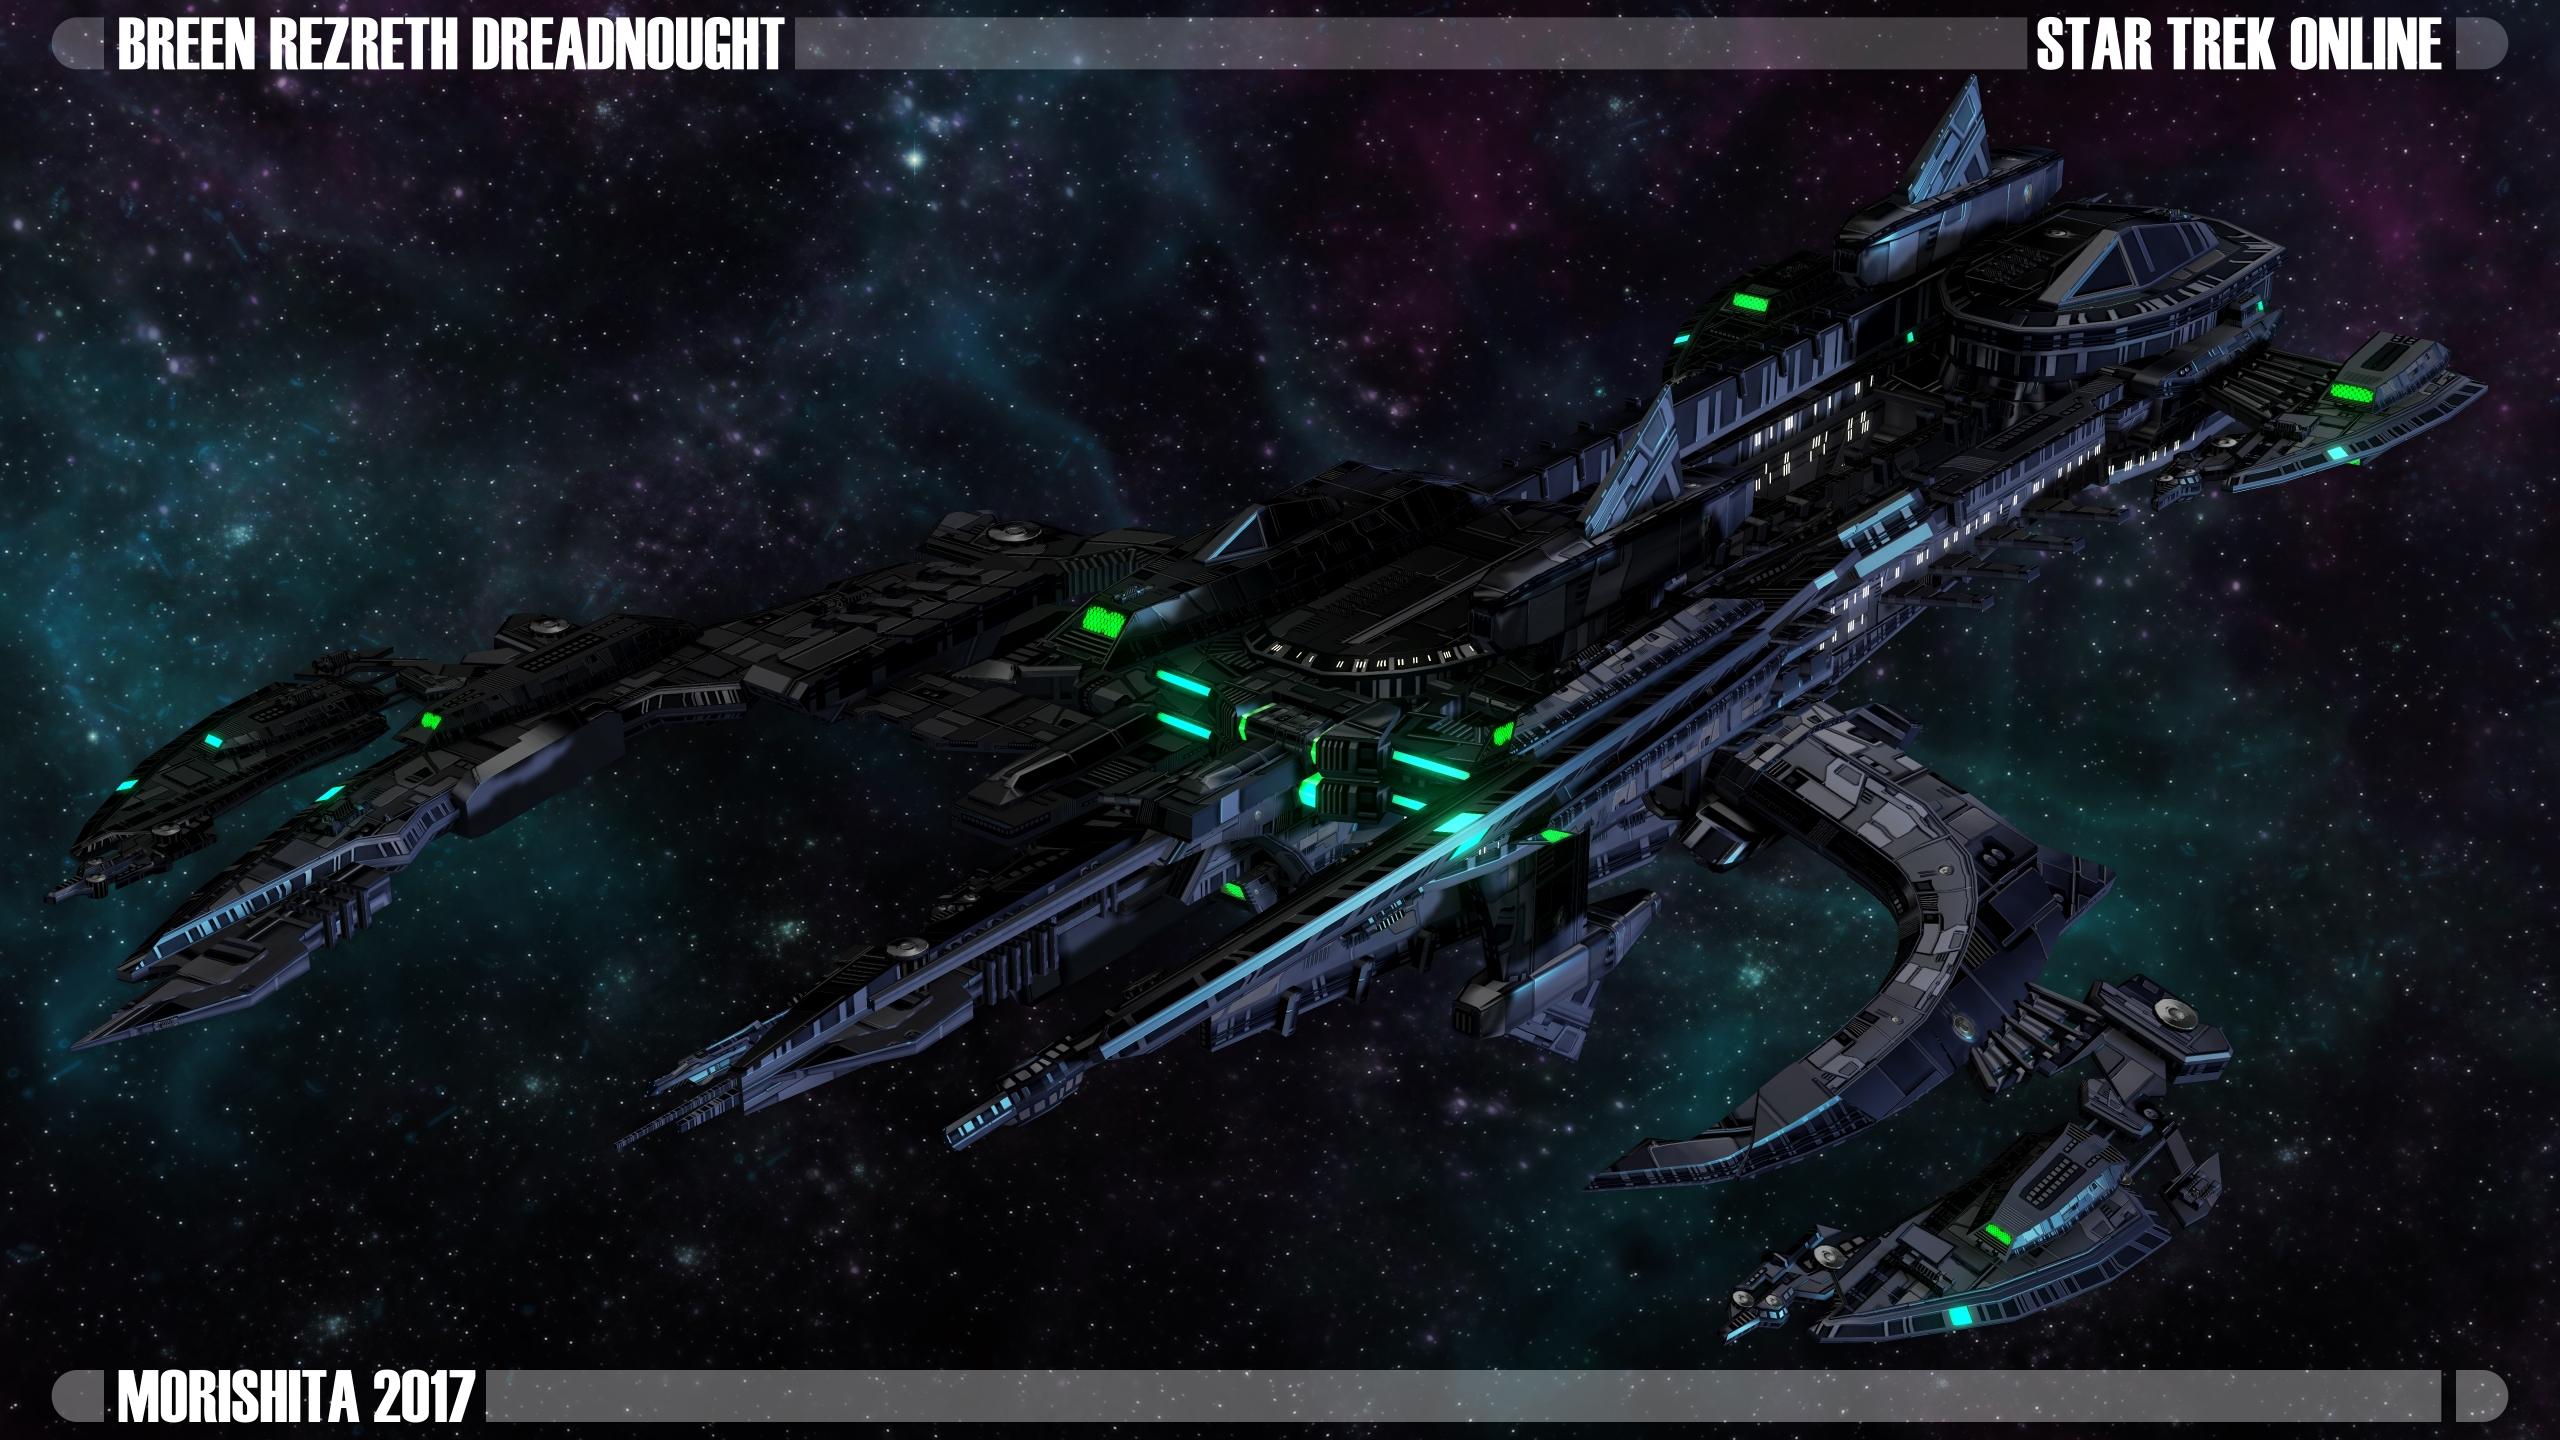 Breen Rezreth Dreadnought #002